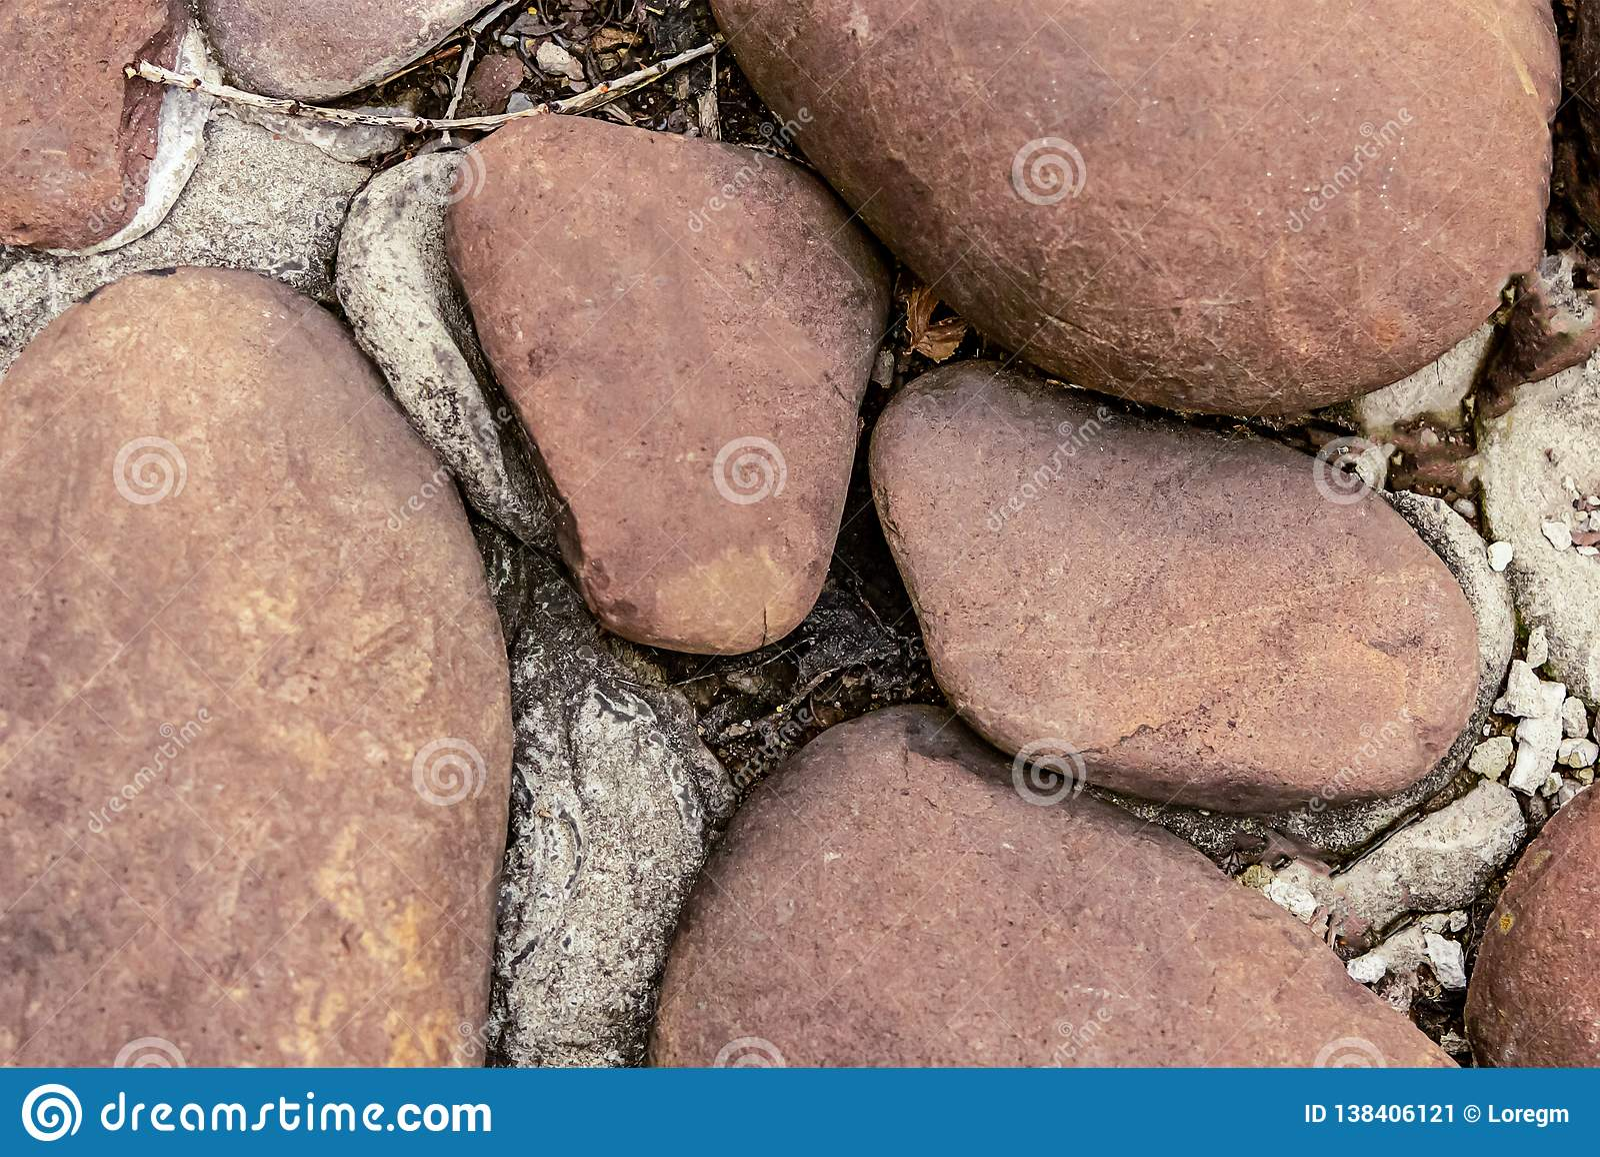 Large brown cobblestone garden decor close-up stone background base design grunge style hard natural